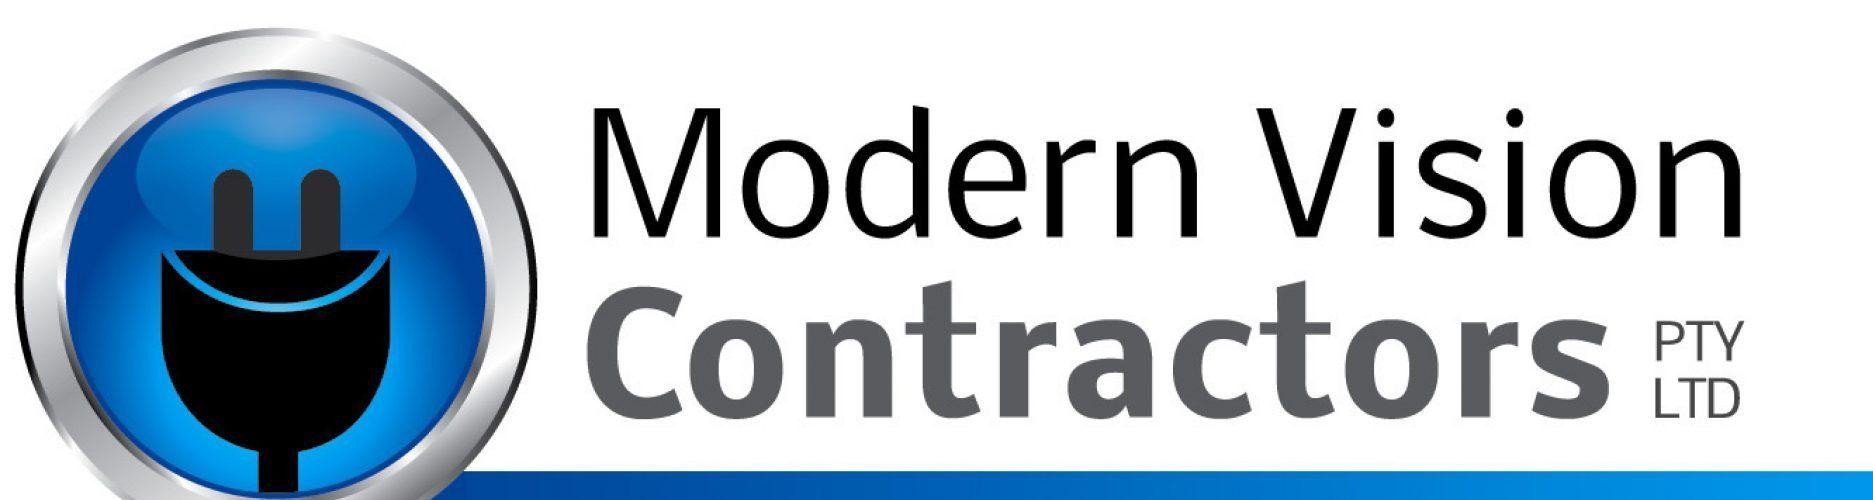 Modern Vision Contractors Pty Ltd